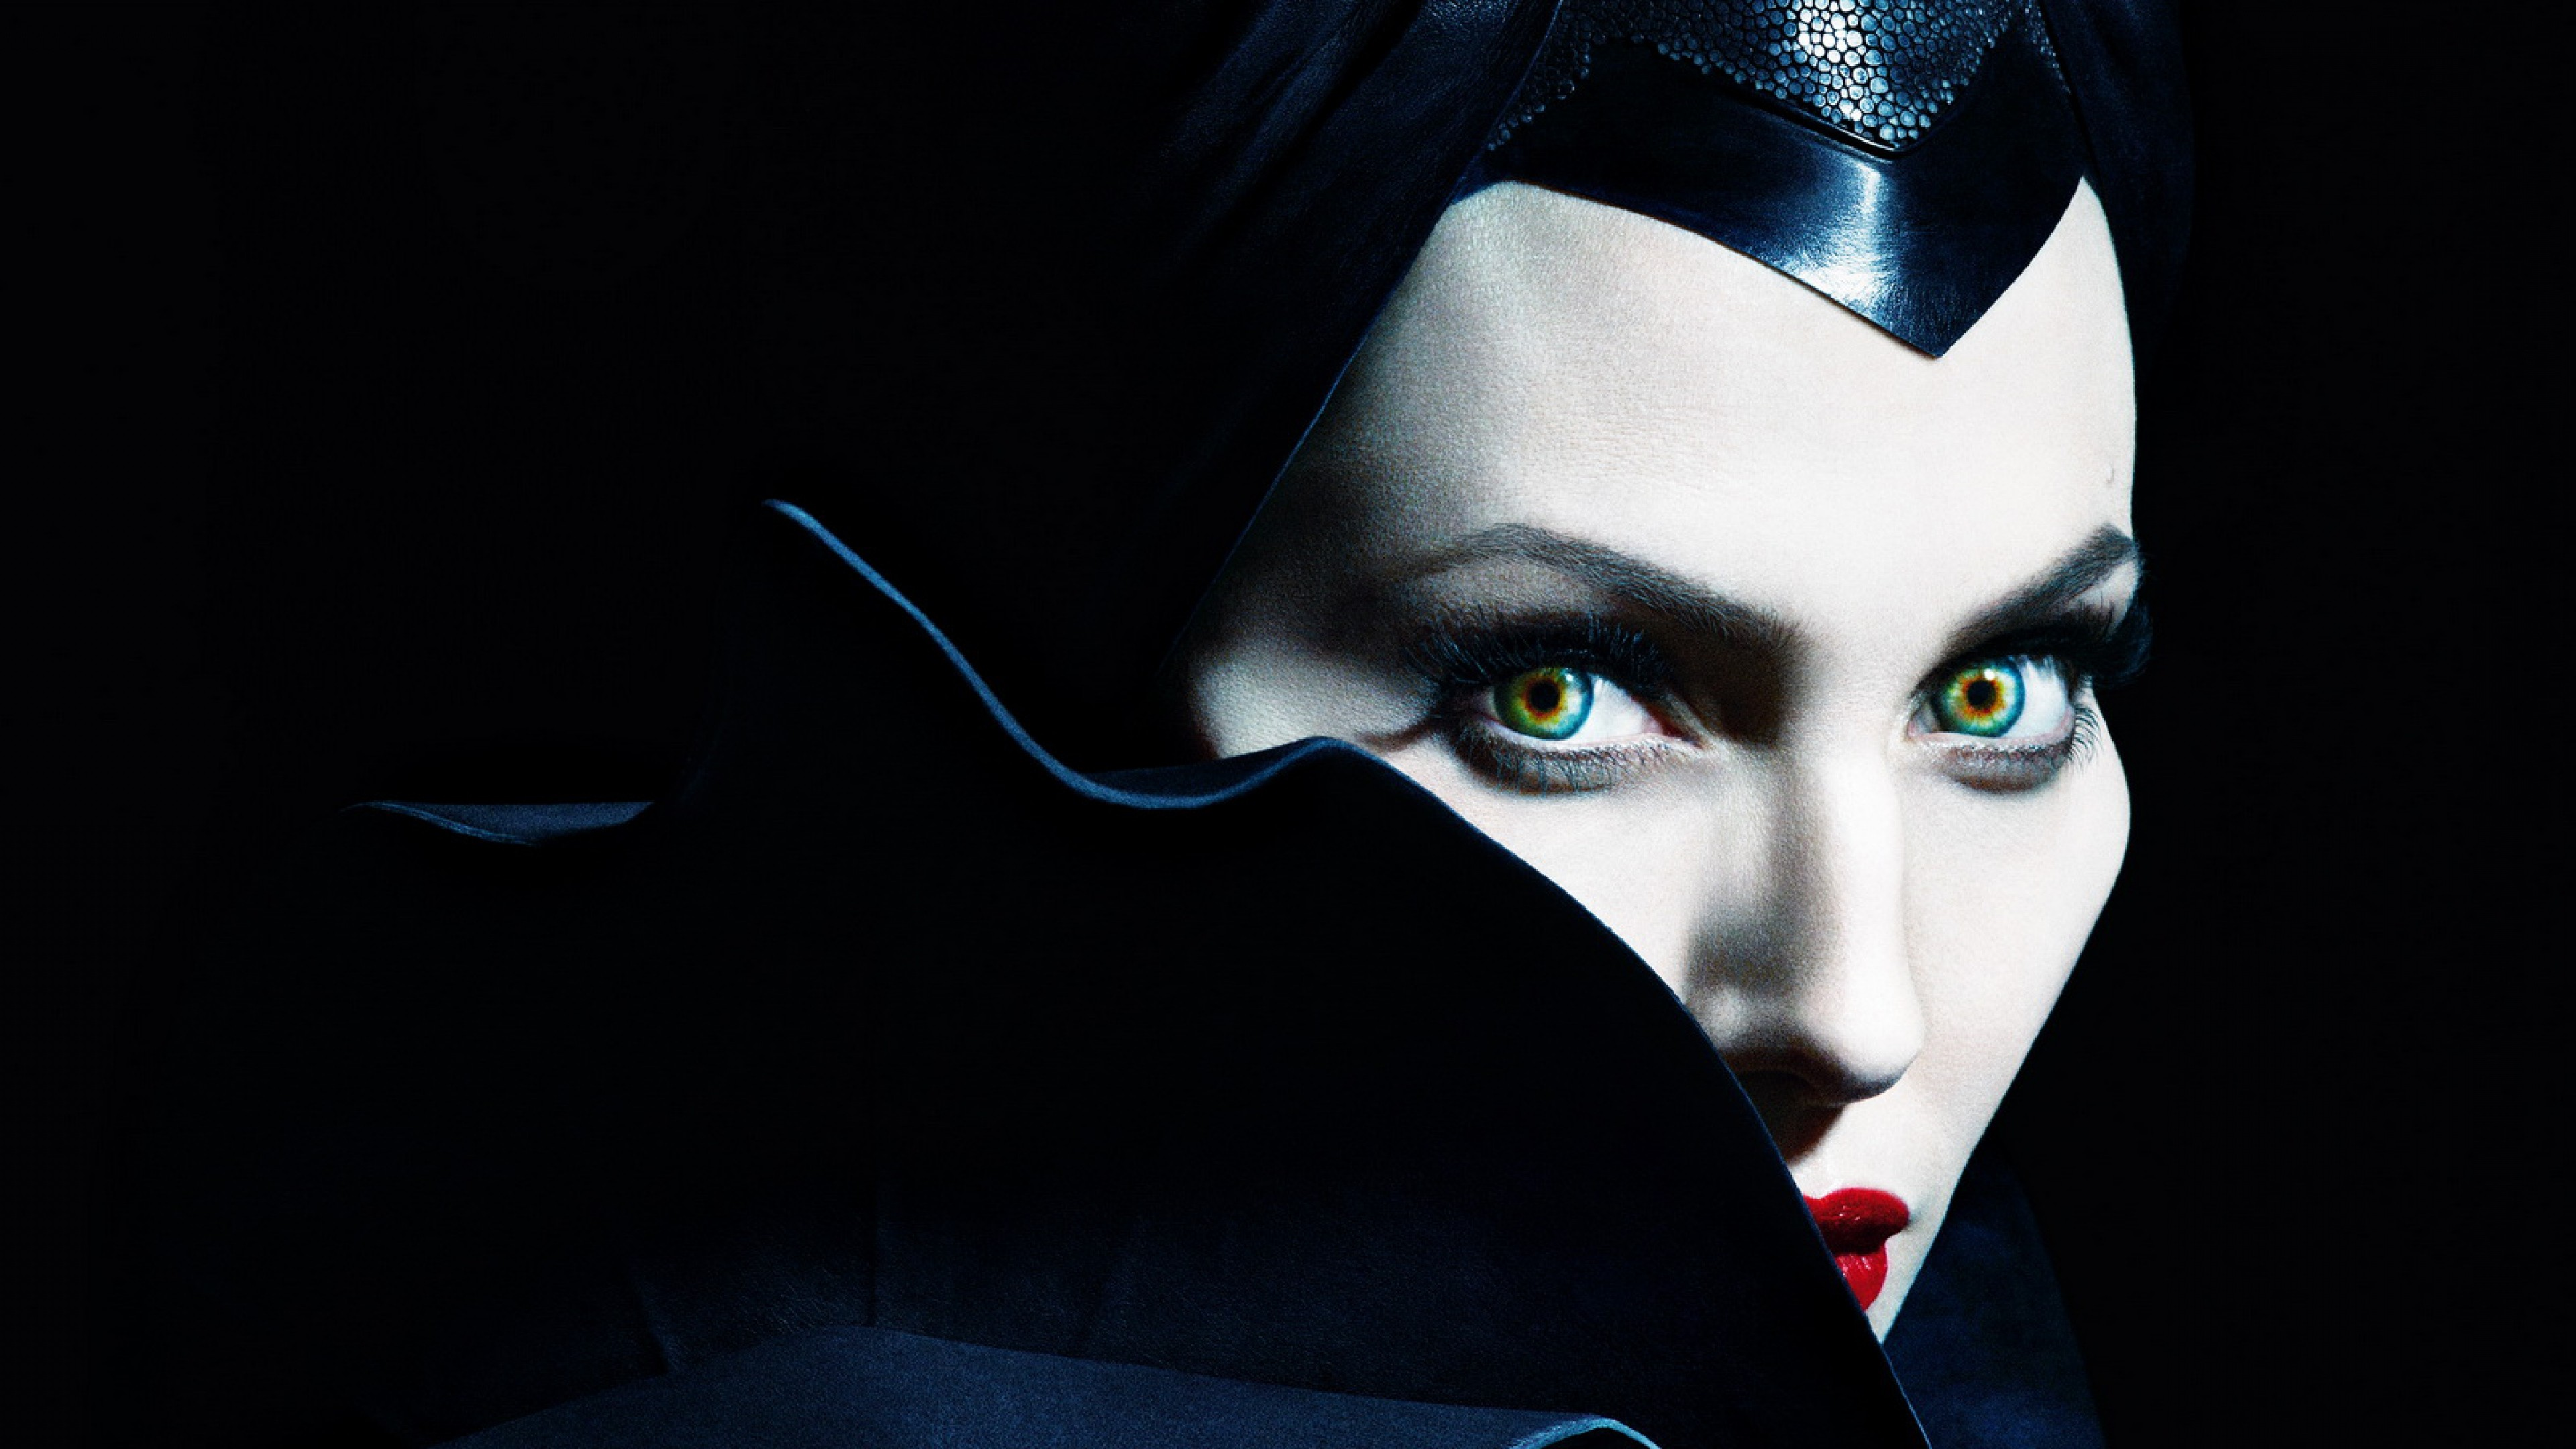 Maleficent 2